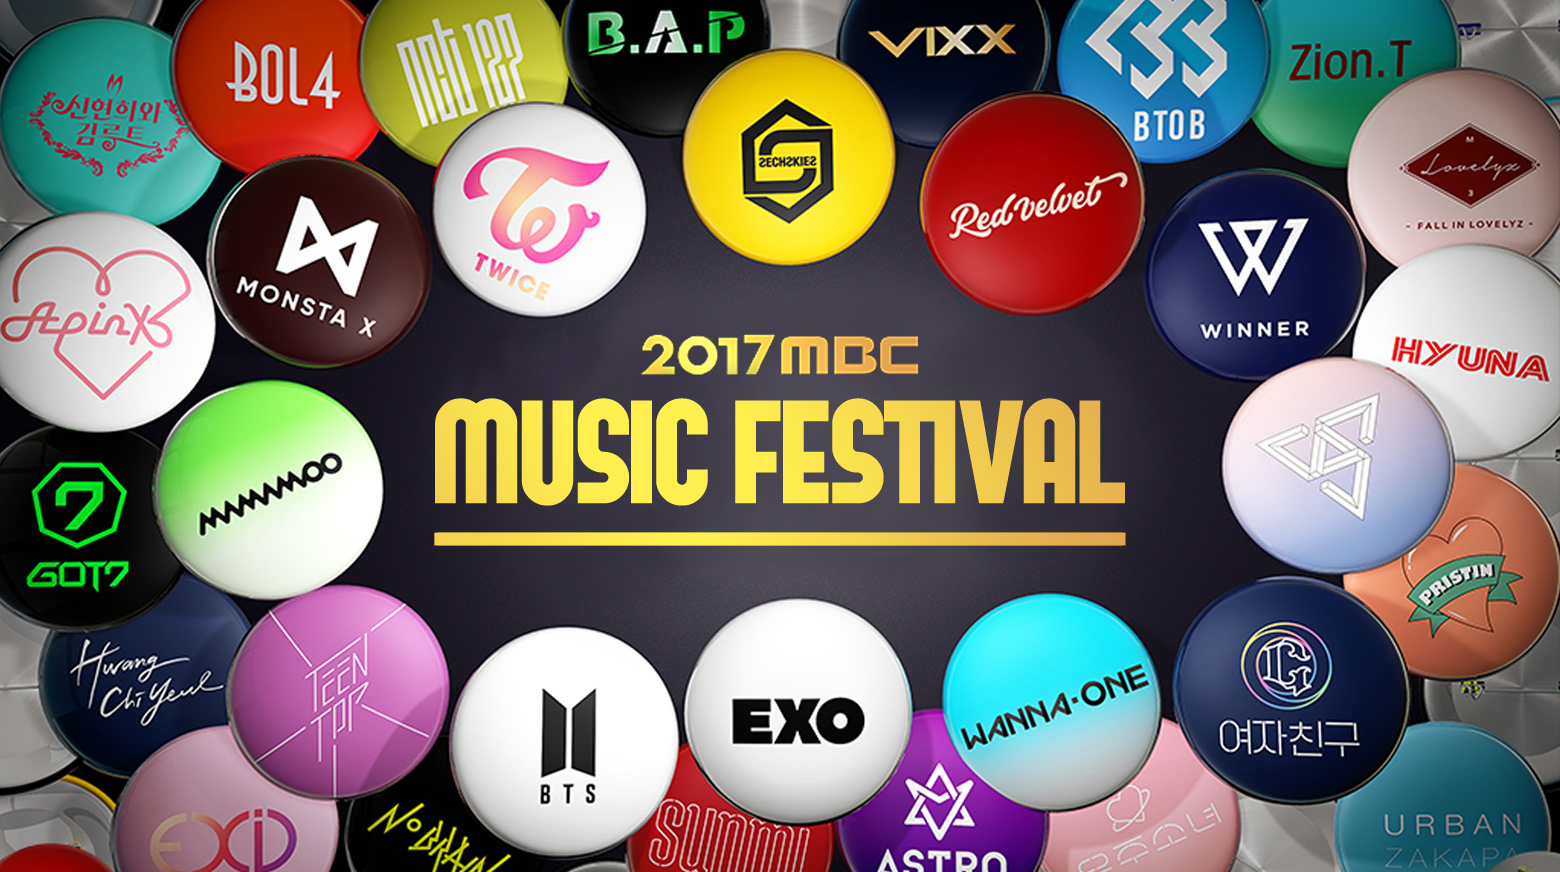 2017 MBC Music Festival